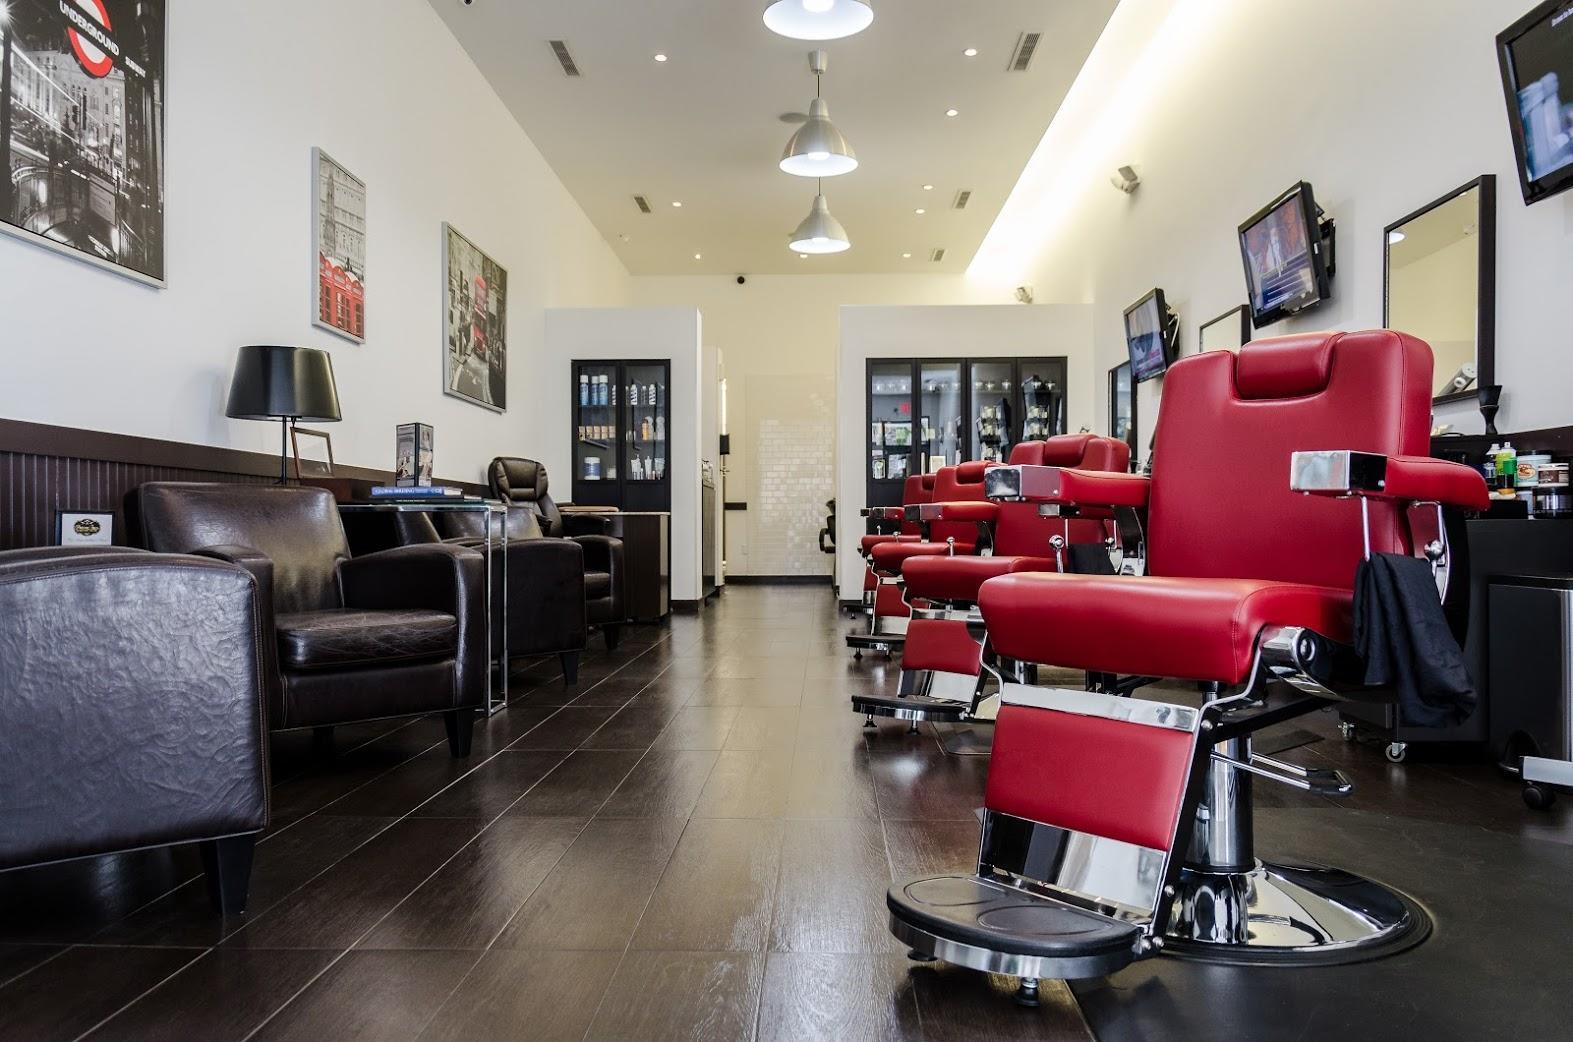 Prestigious Image Barbershop and Spa image 4